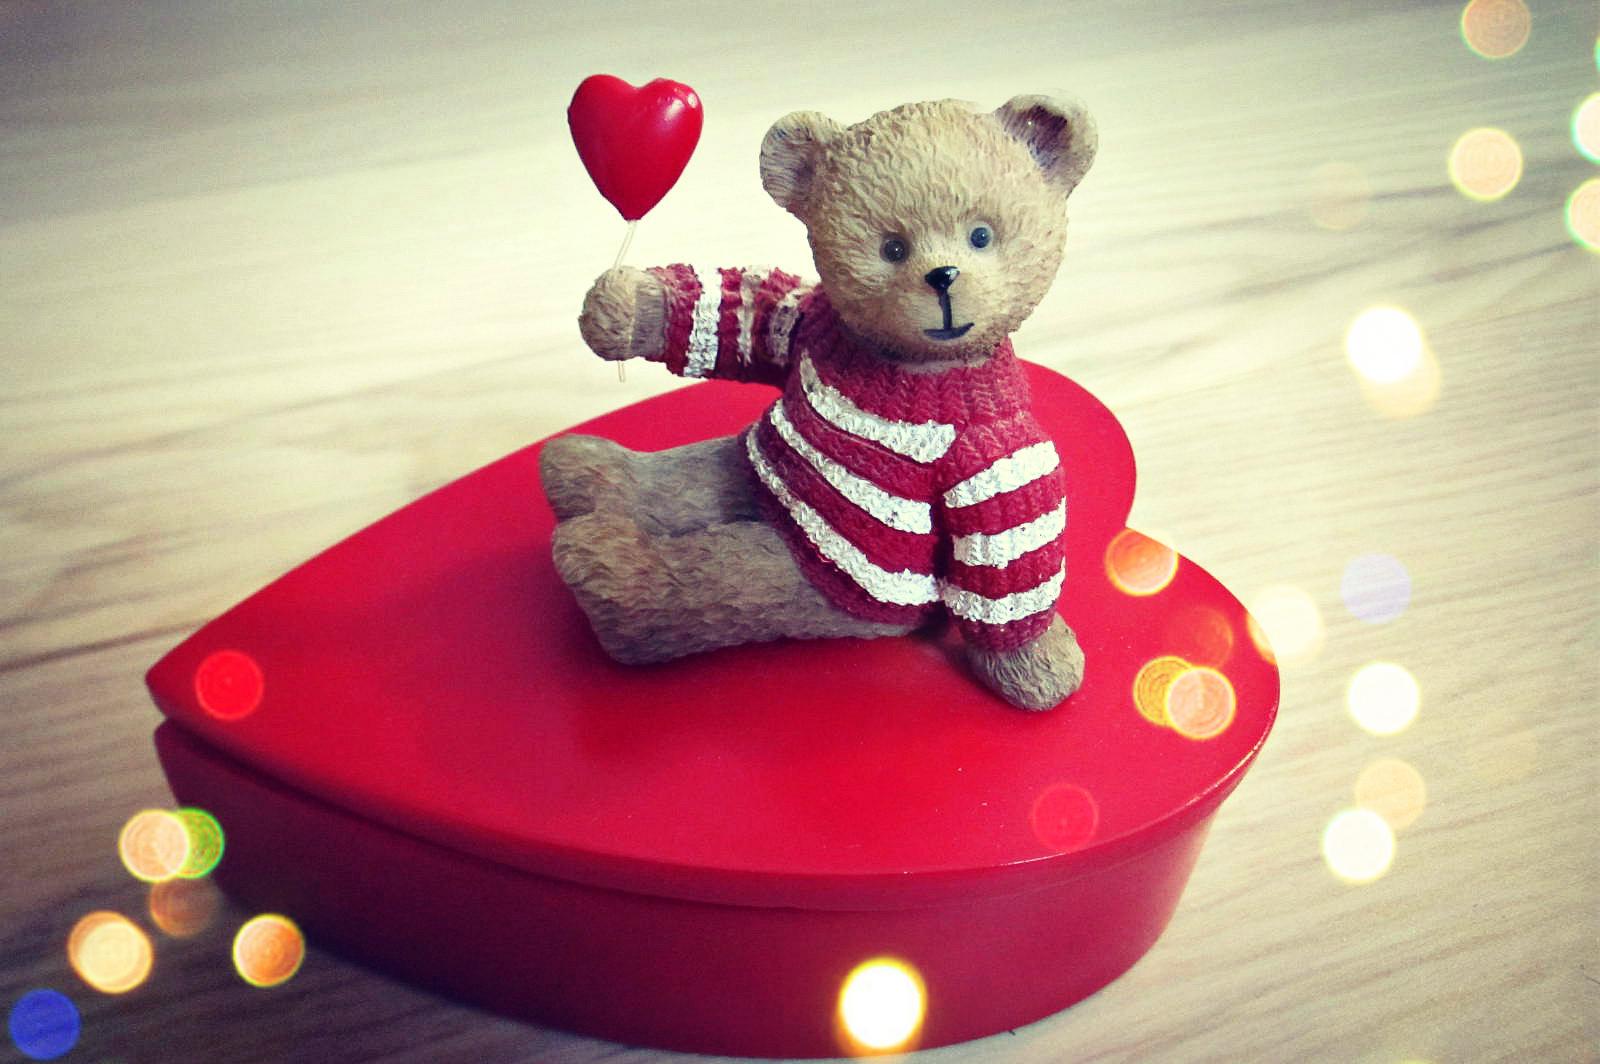 Love Teddy Bear Wallpapers Wallpapersafari